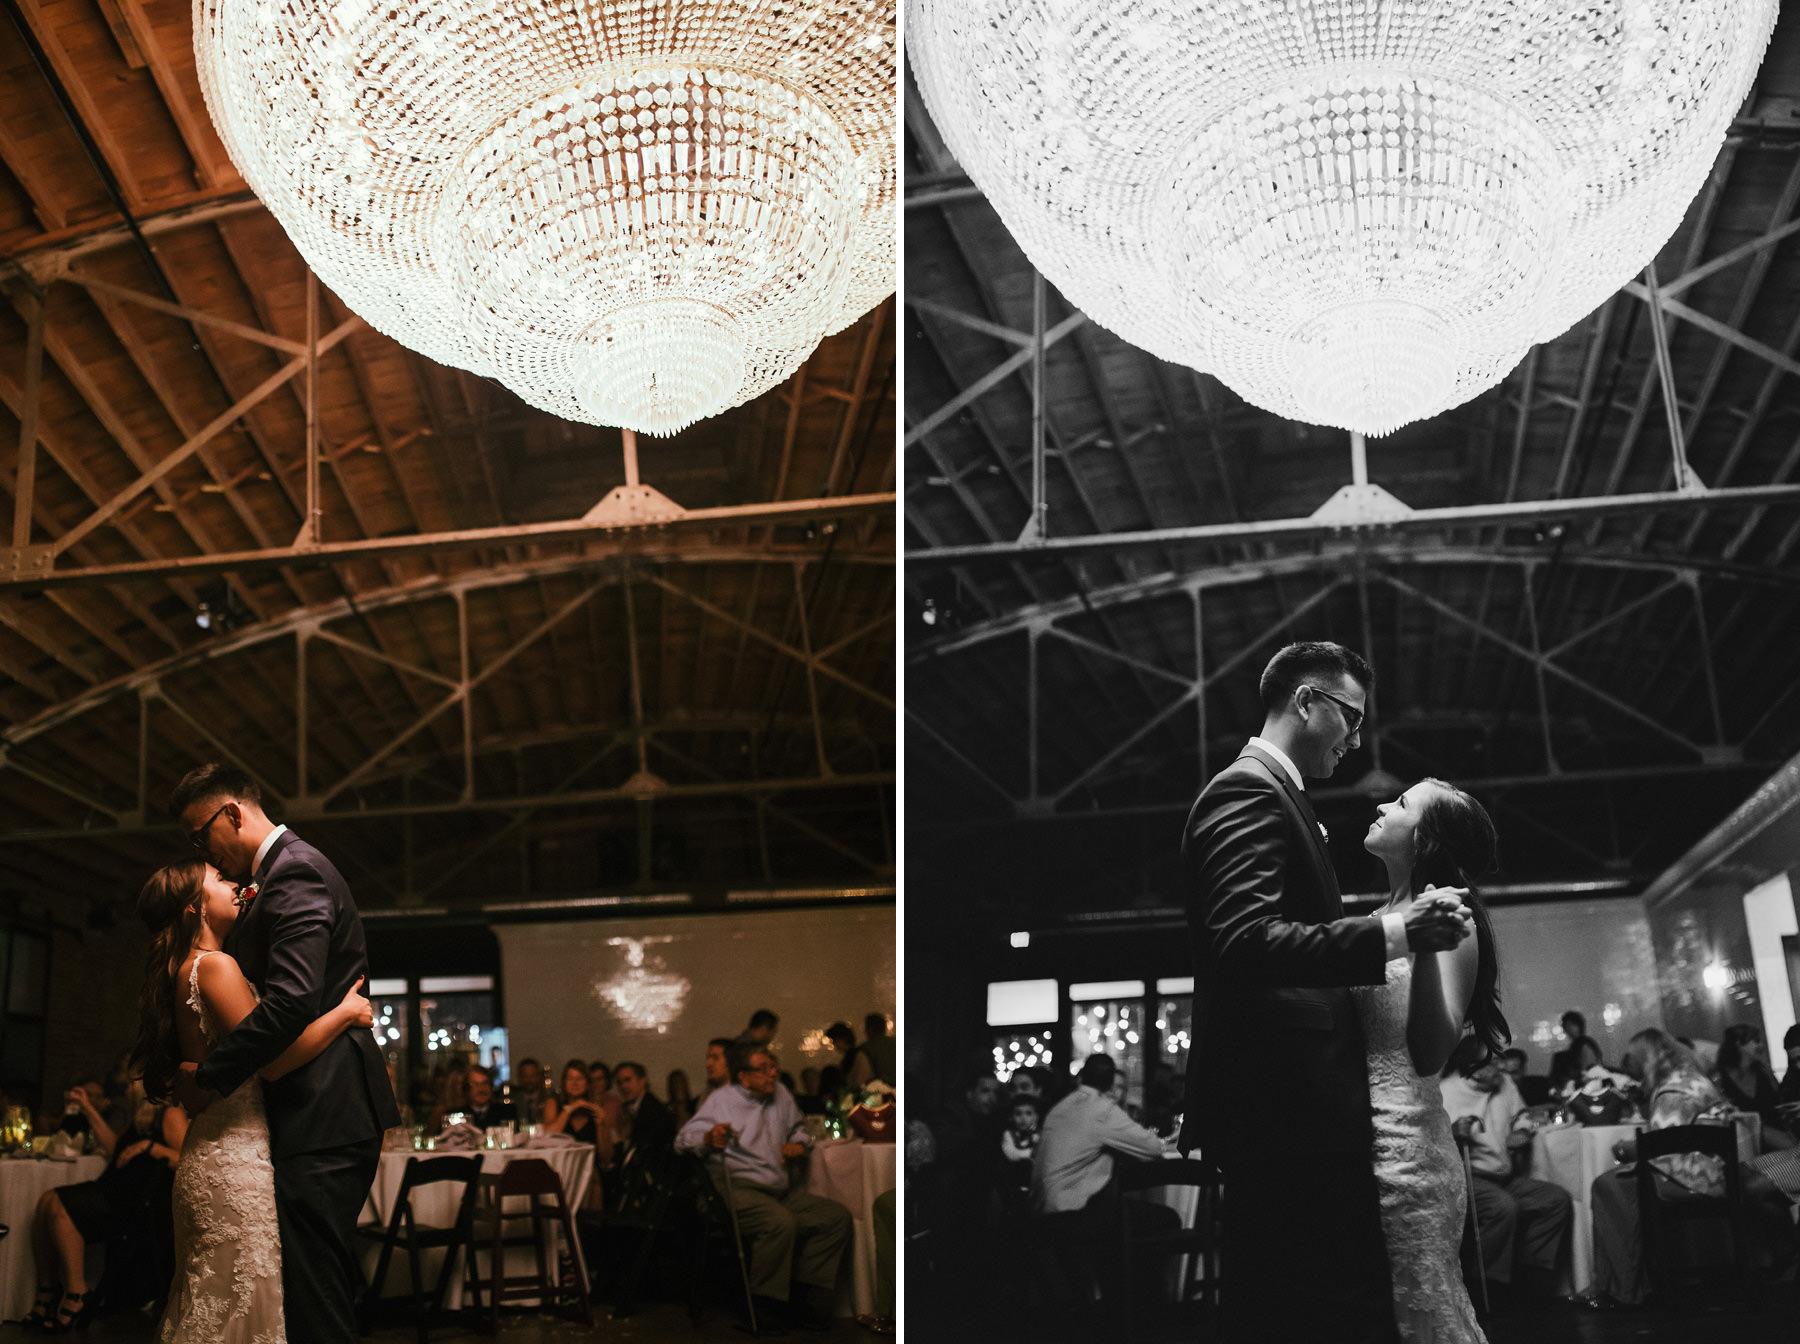 Kansas City Summer Wedding at the Guild_Kindling Wedding Photography Blog75.JPG